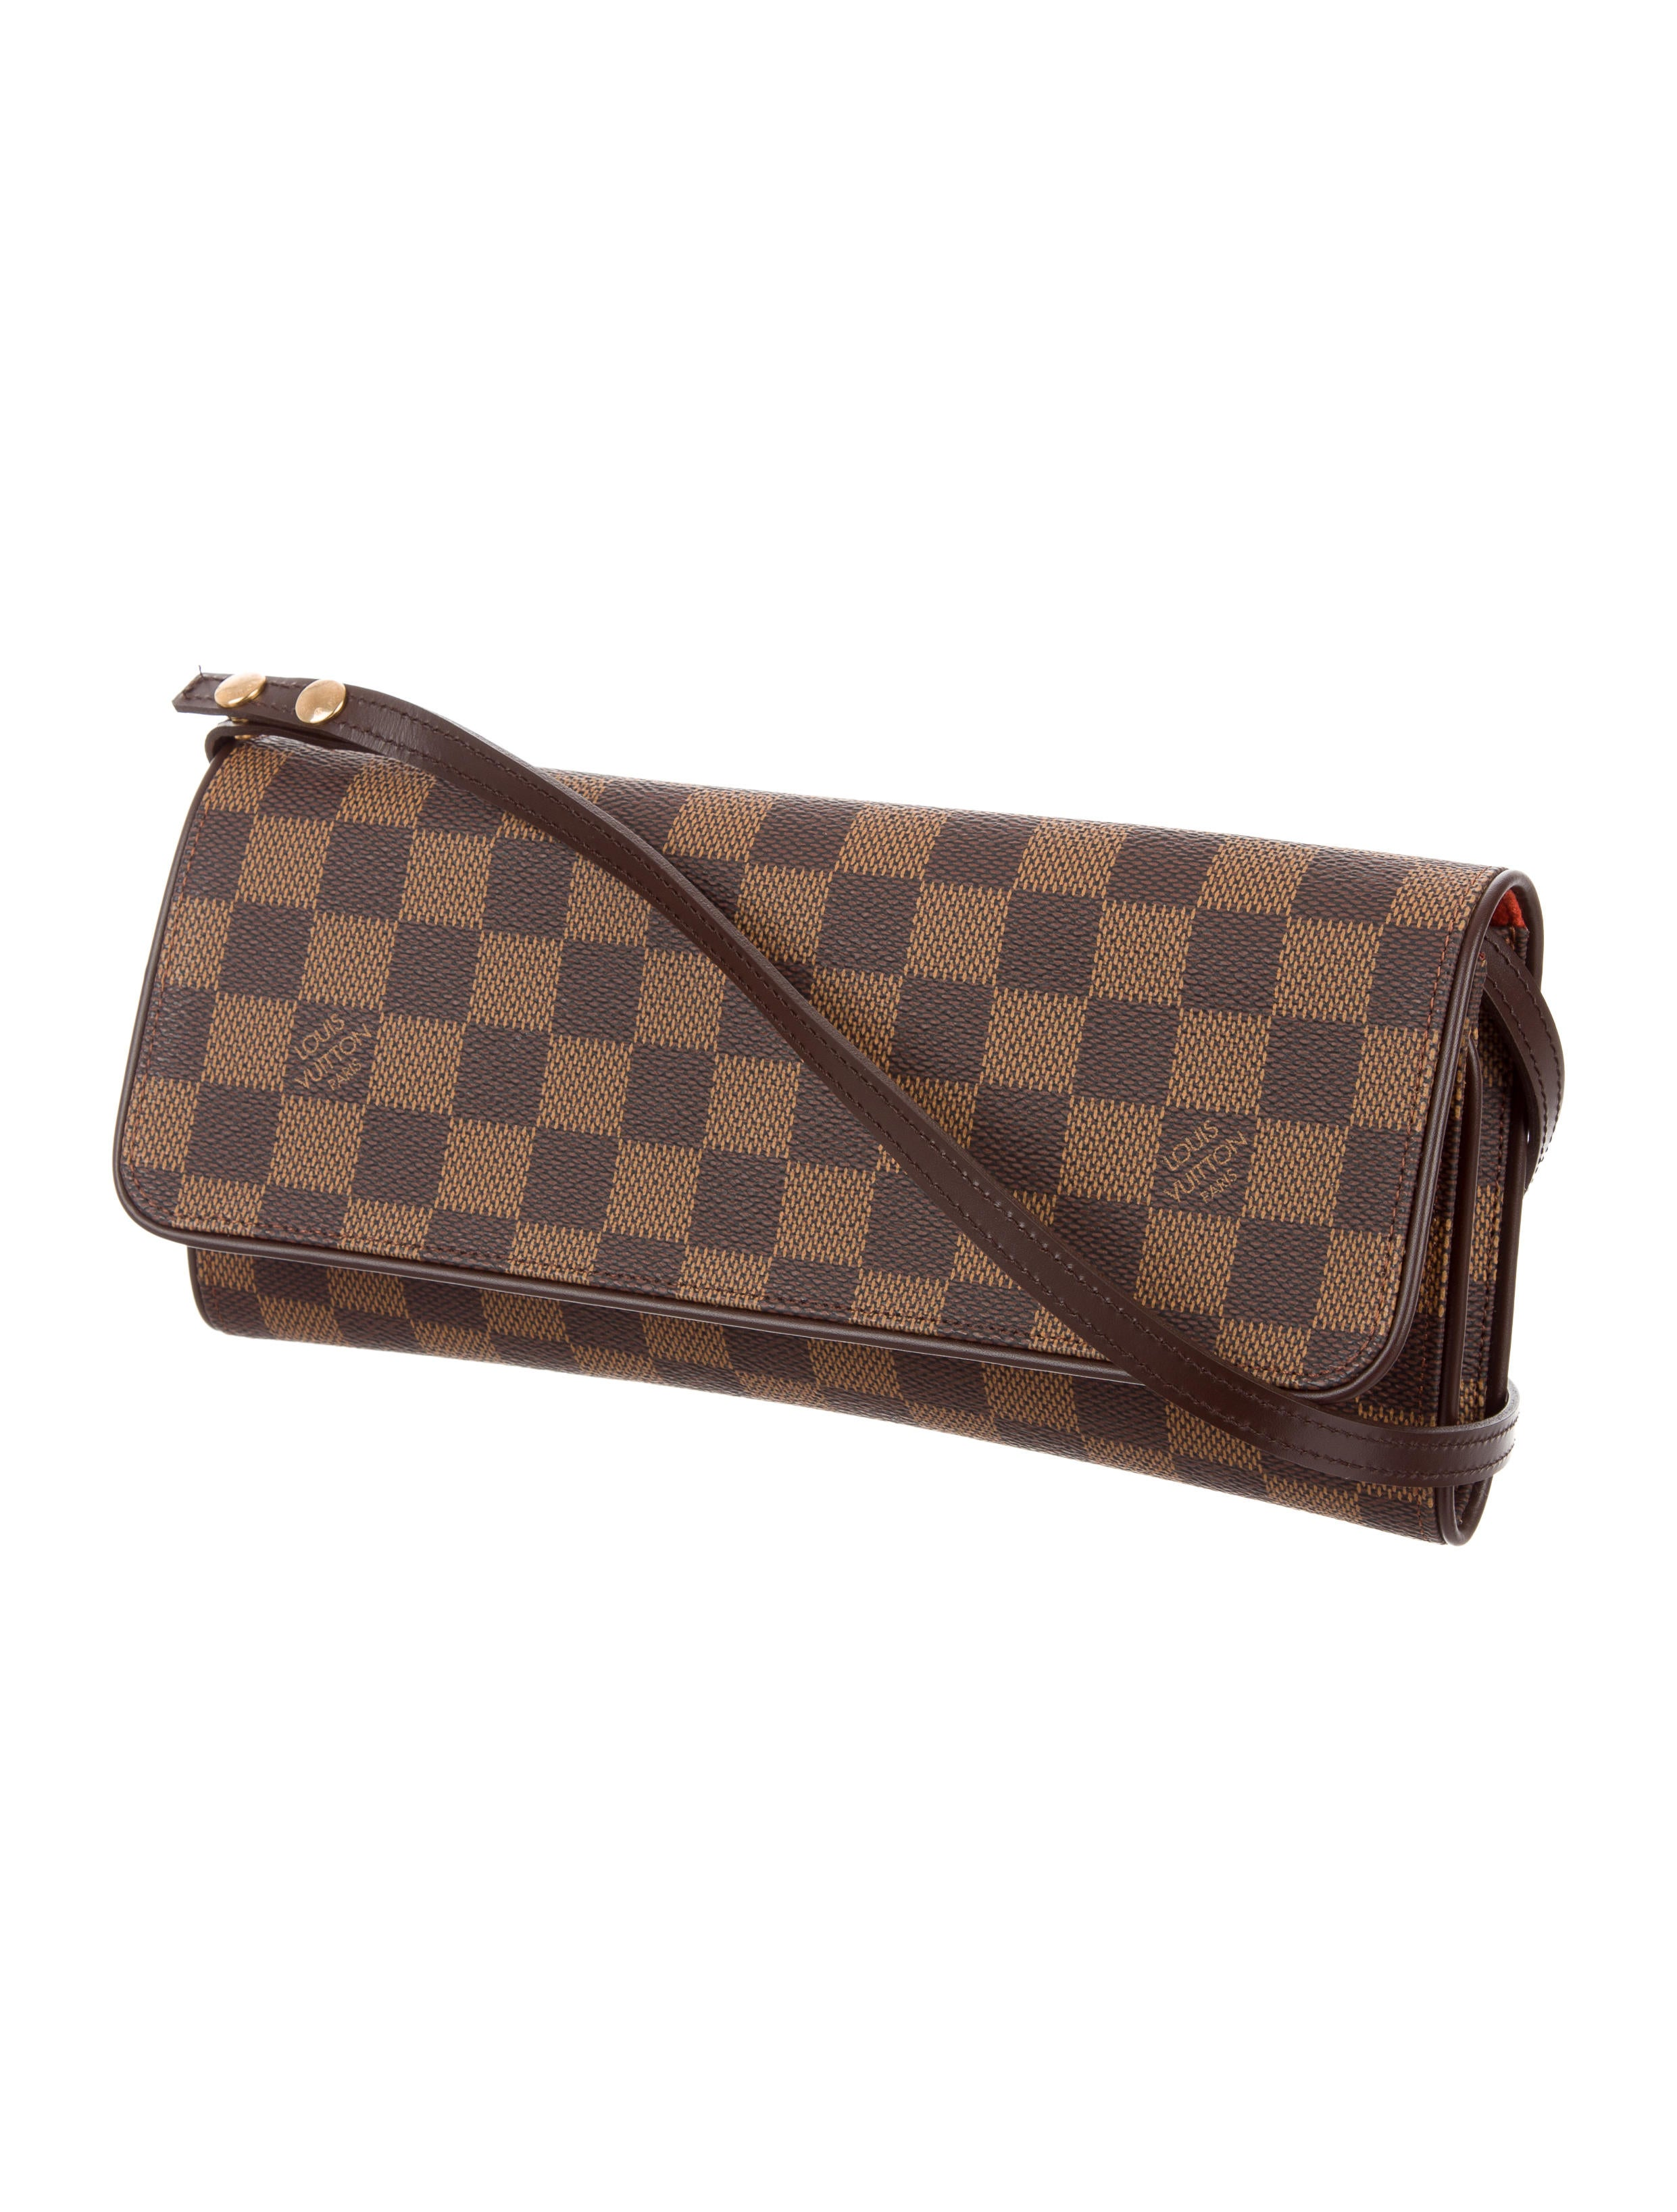 louis vuitton damier ebene pochette twin gm handbags. Black Bedroom Furniture Sets. Home Design Ideas